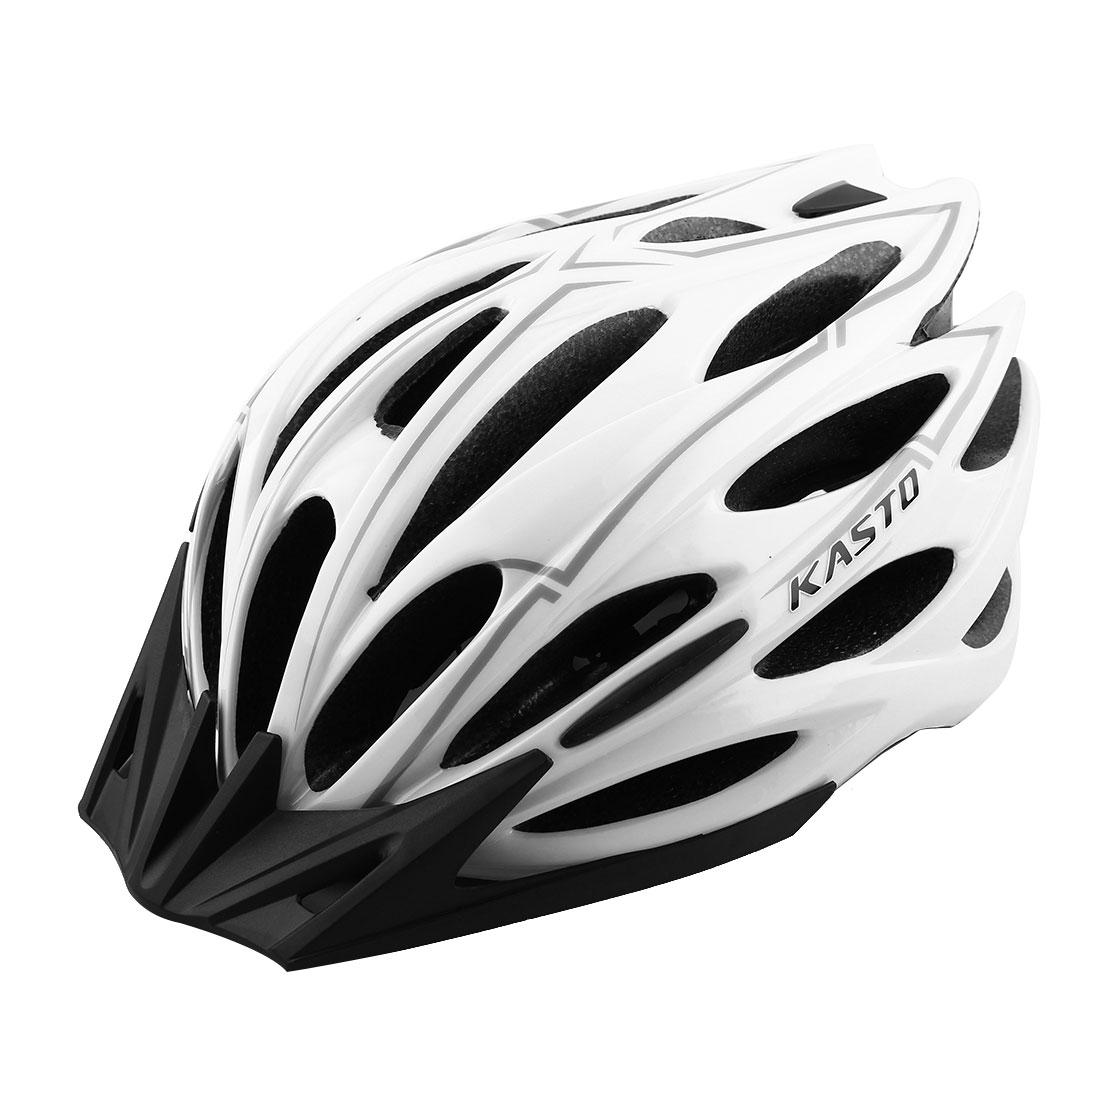 Adult Unisex 25 Holes Rotary Regulator Cycling Cap Head Safety Protector Hat Portable Biking Helmet White